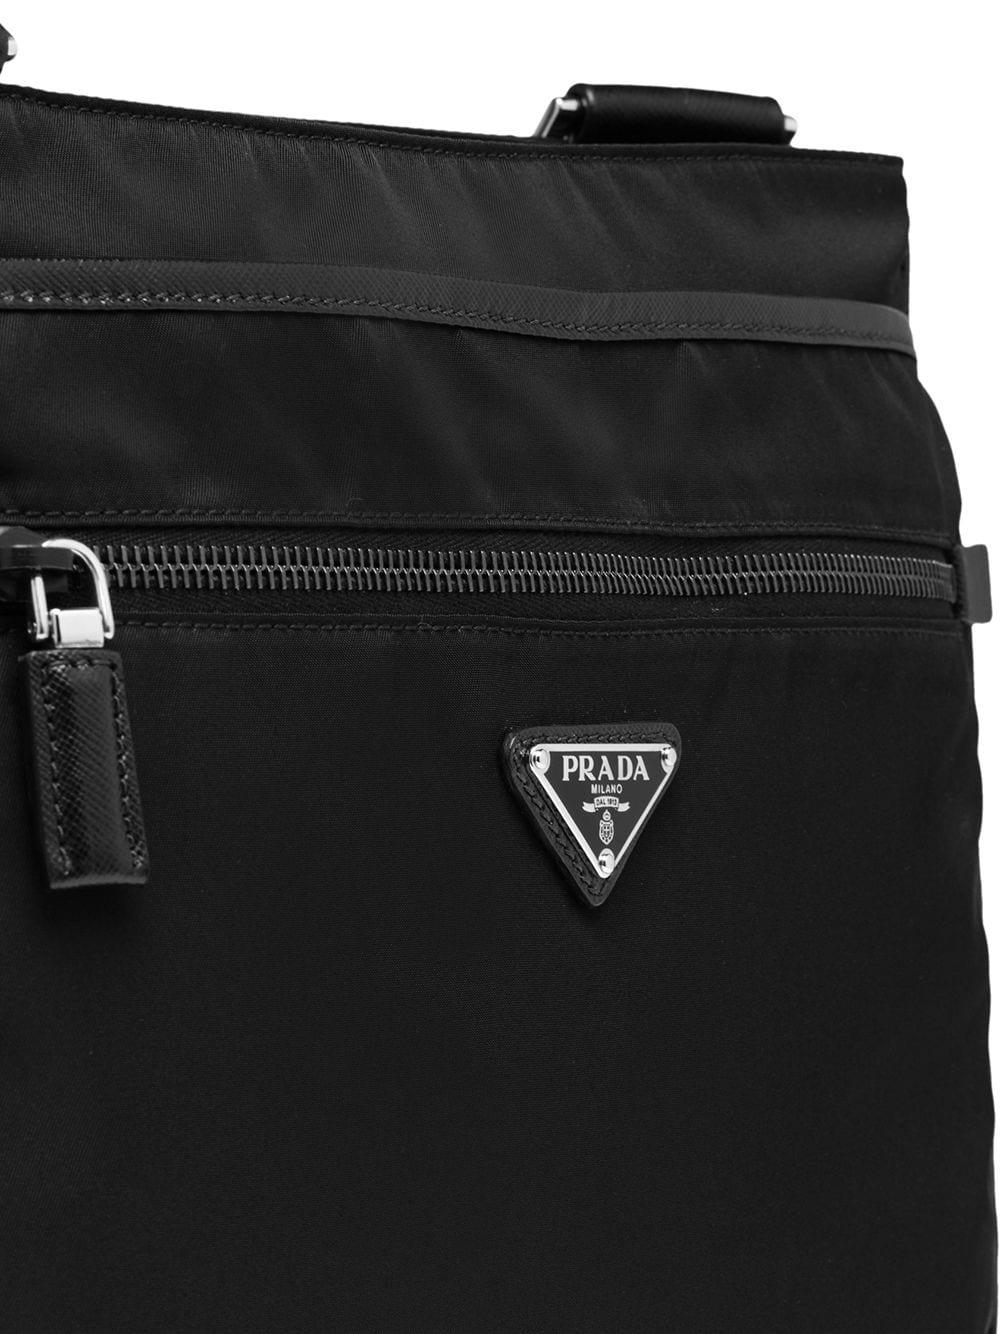 78553c7b1ec5 ... new style prada black nylon bag for men lyst. view fullscreen e220c  05a17